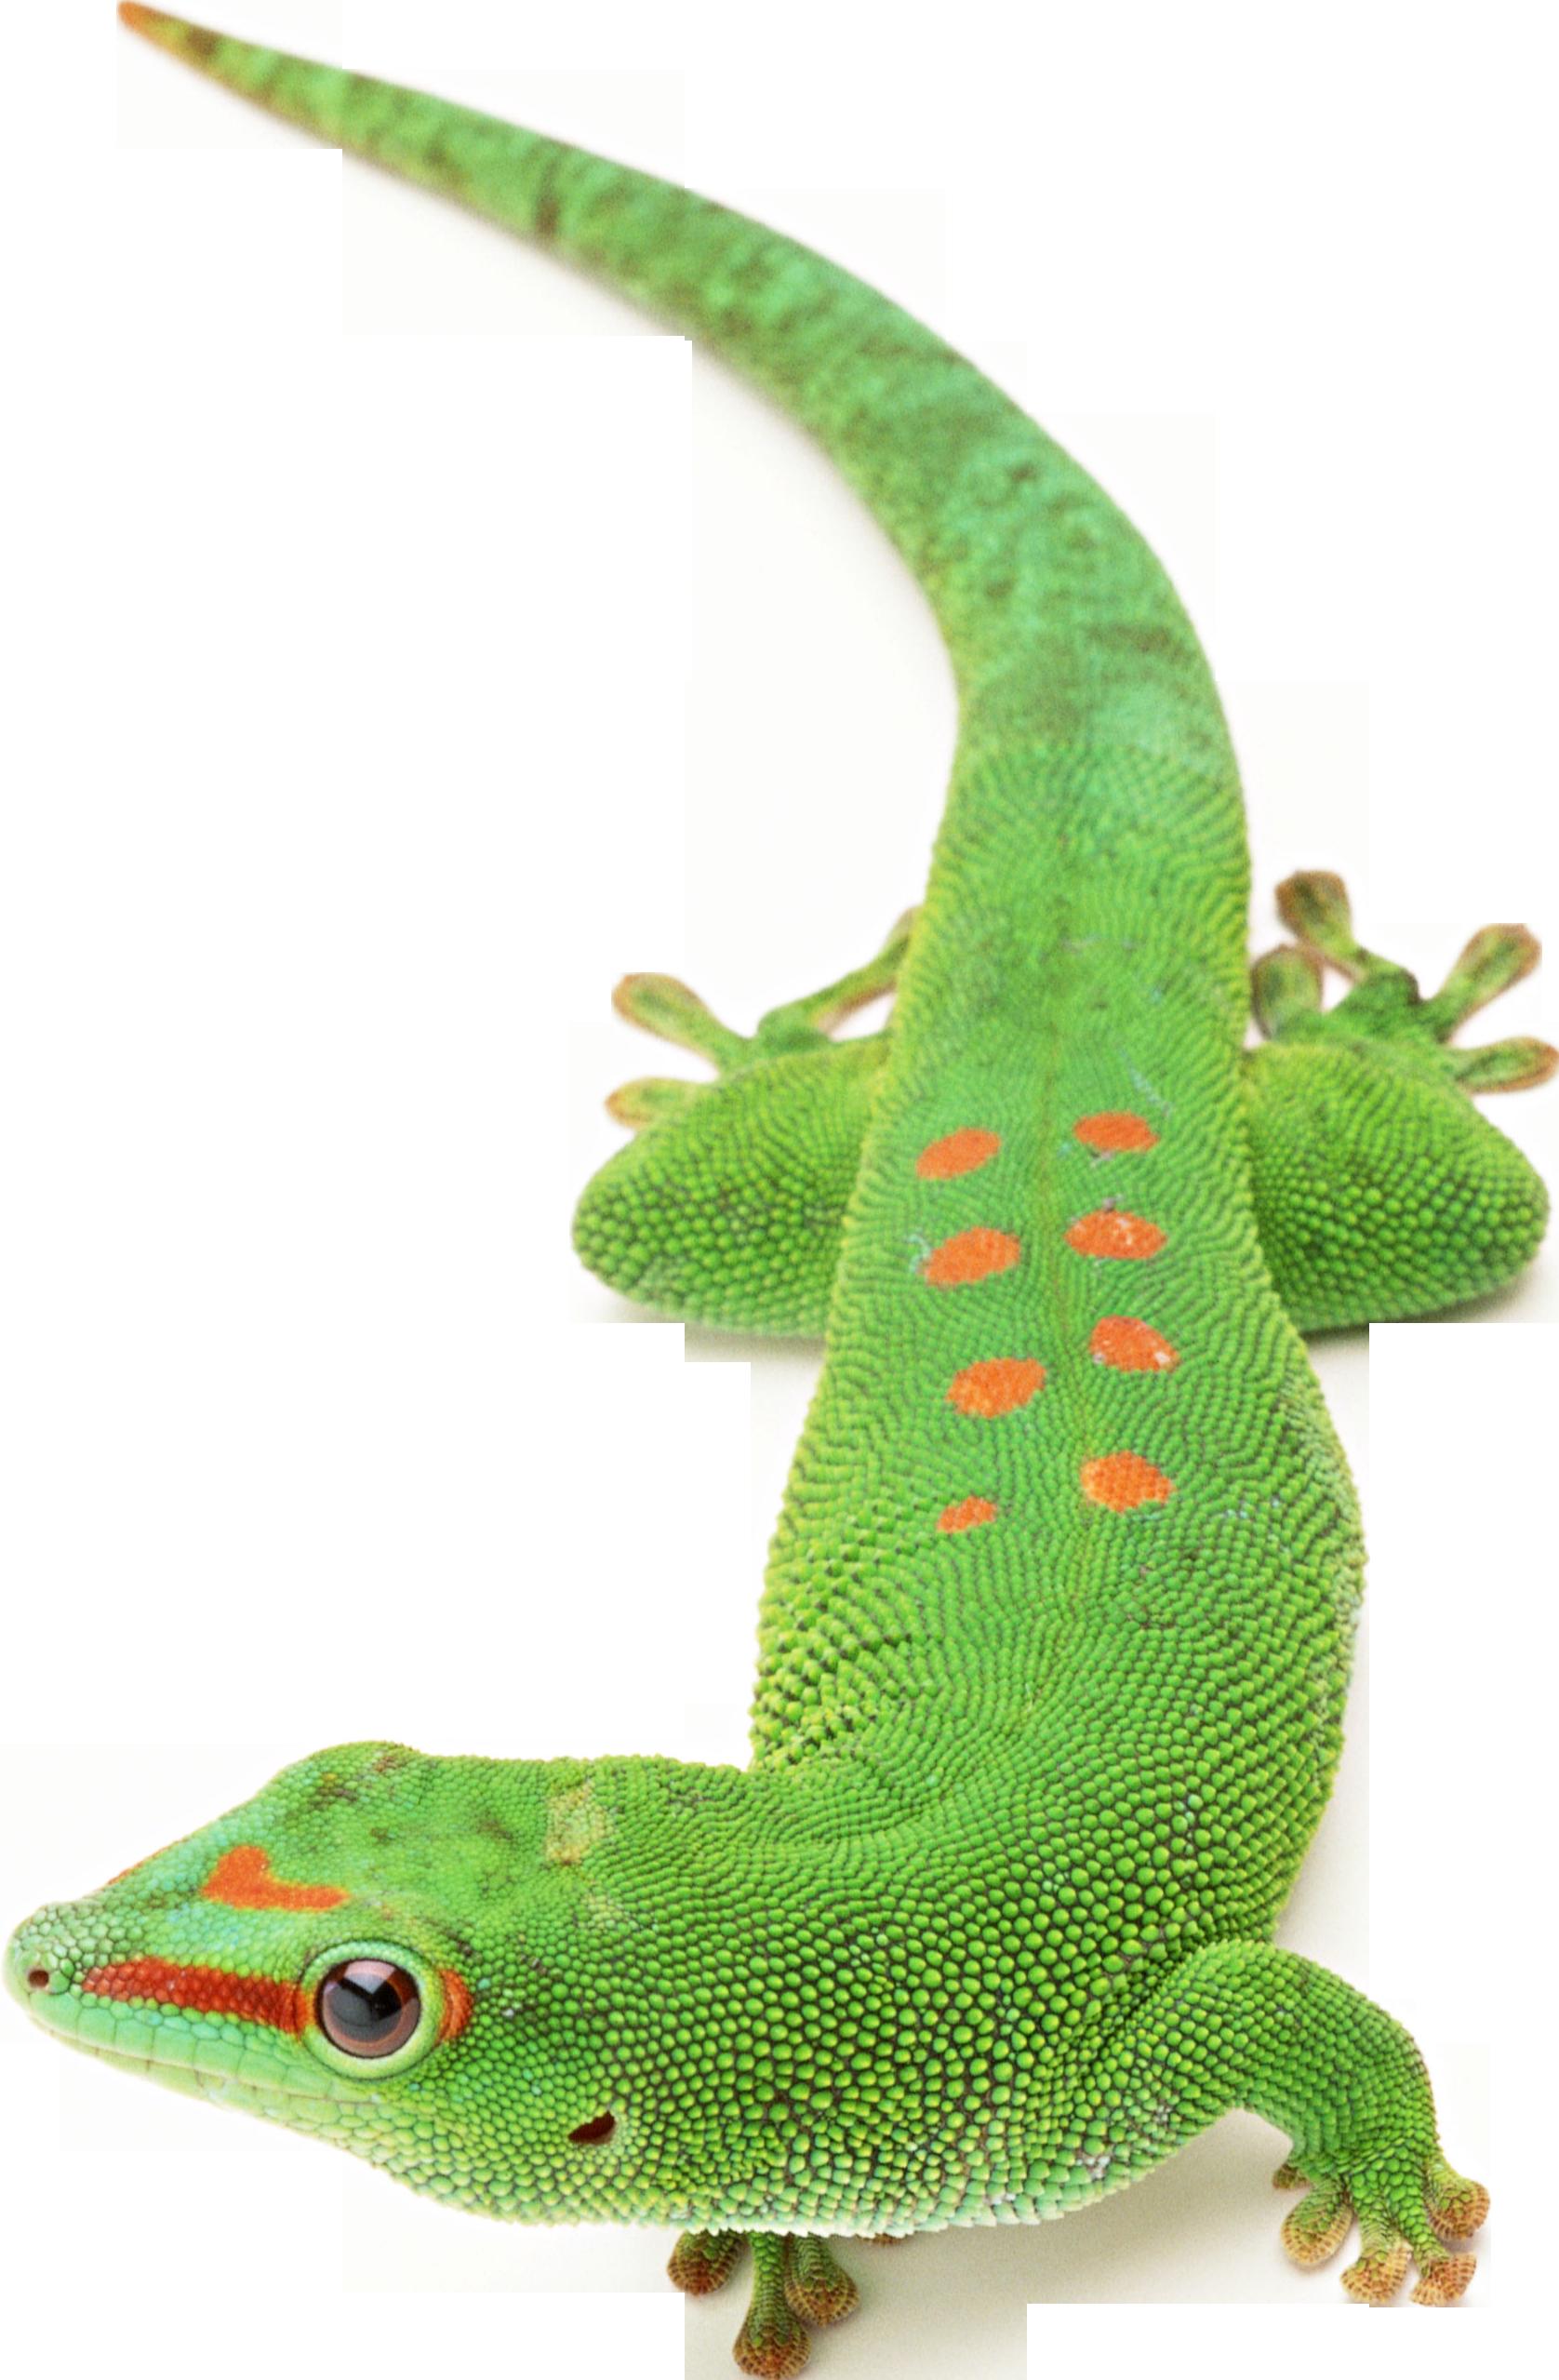 Lizard png . Gecko clipart transparent background